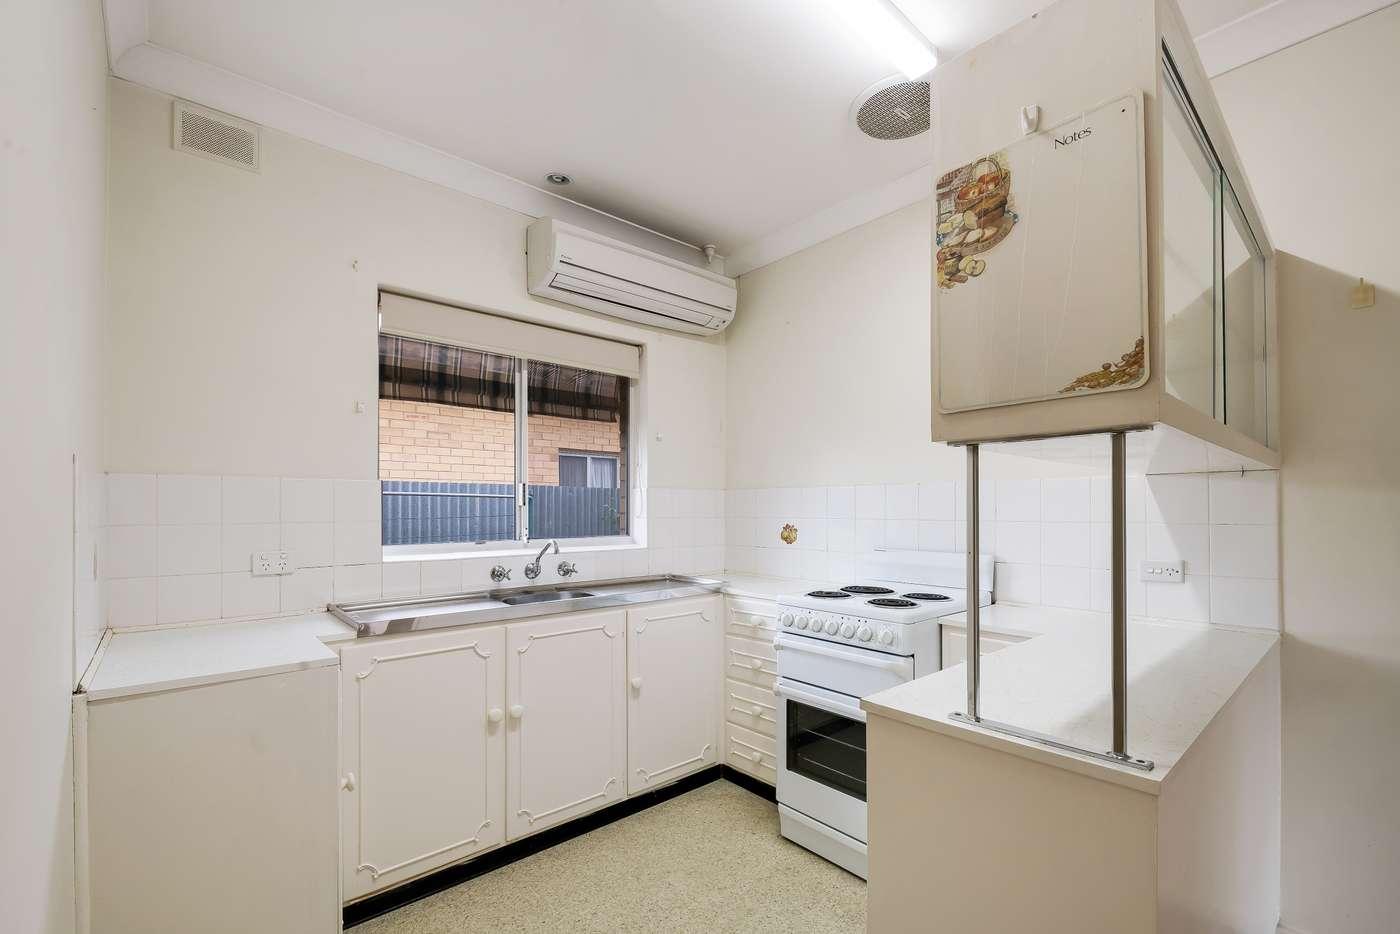 Sixth view of Homely house listing, 3/15 Marlborough Street, Brighton SA 5048